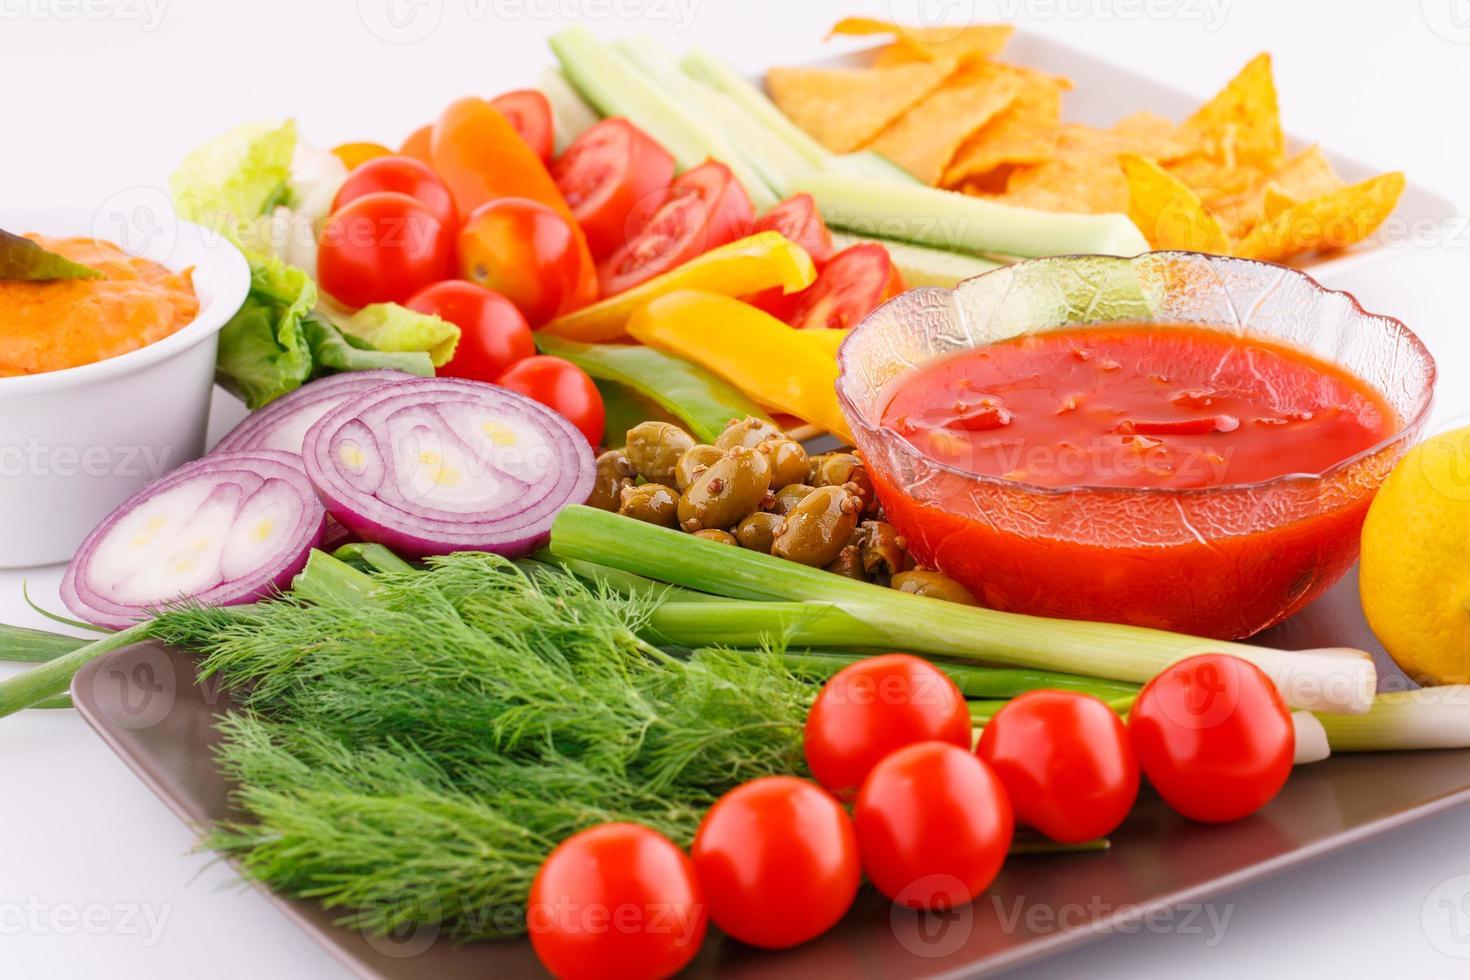 verdure, olive, nachos, salsa rossa e formaggio foto